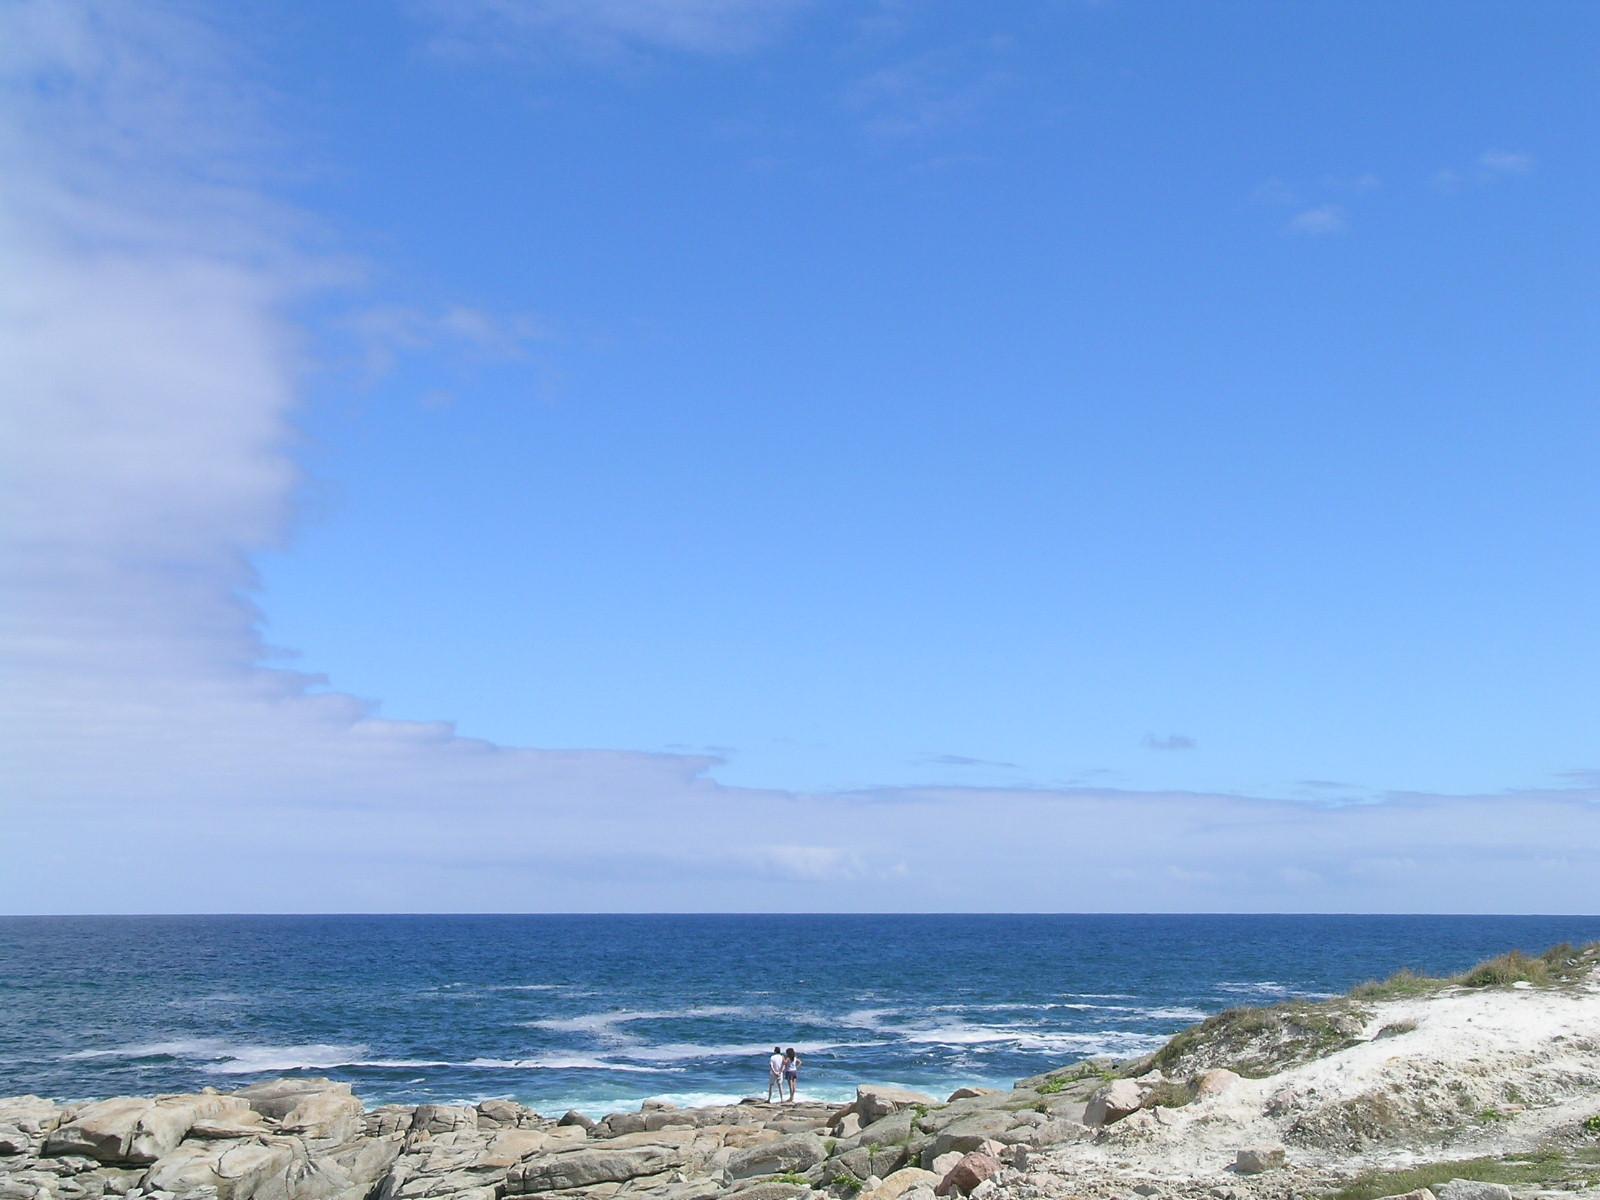 Foto playa Peizas. Playas de Foz - Lugo - Spain